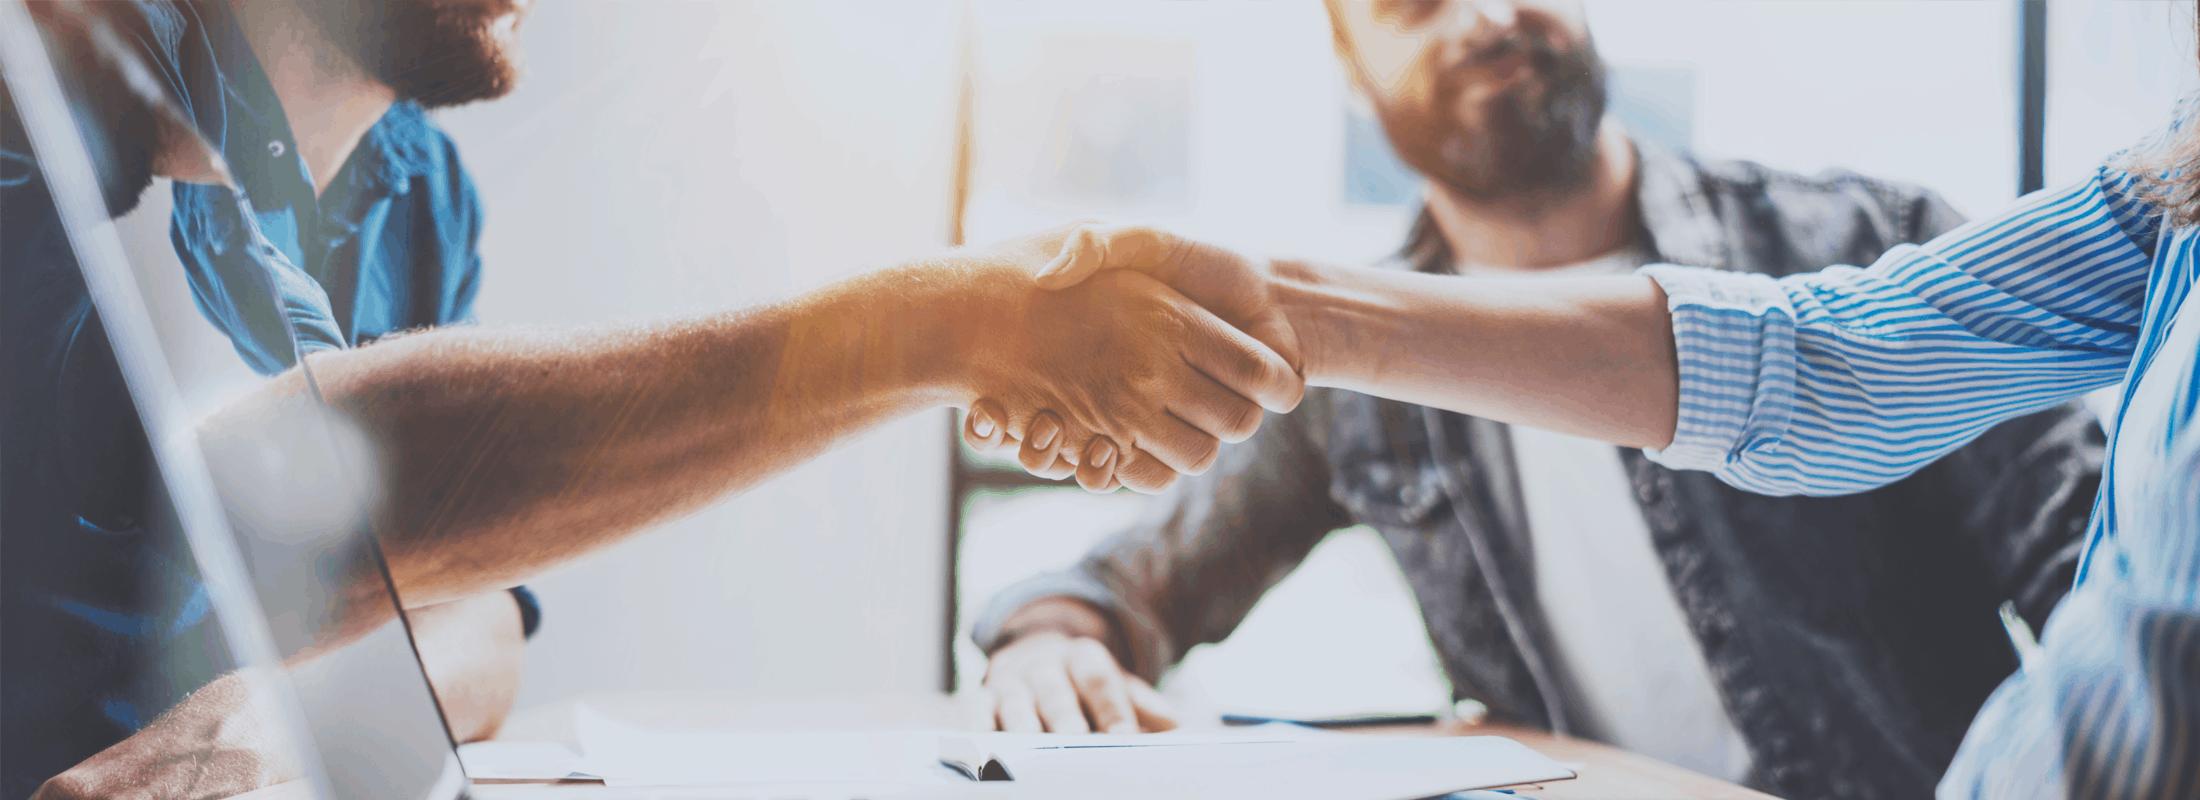 Lynxx Business Partnerships